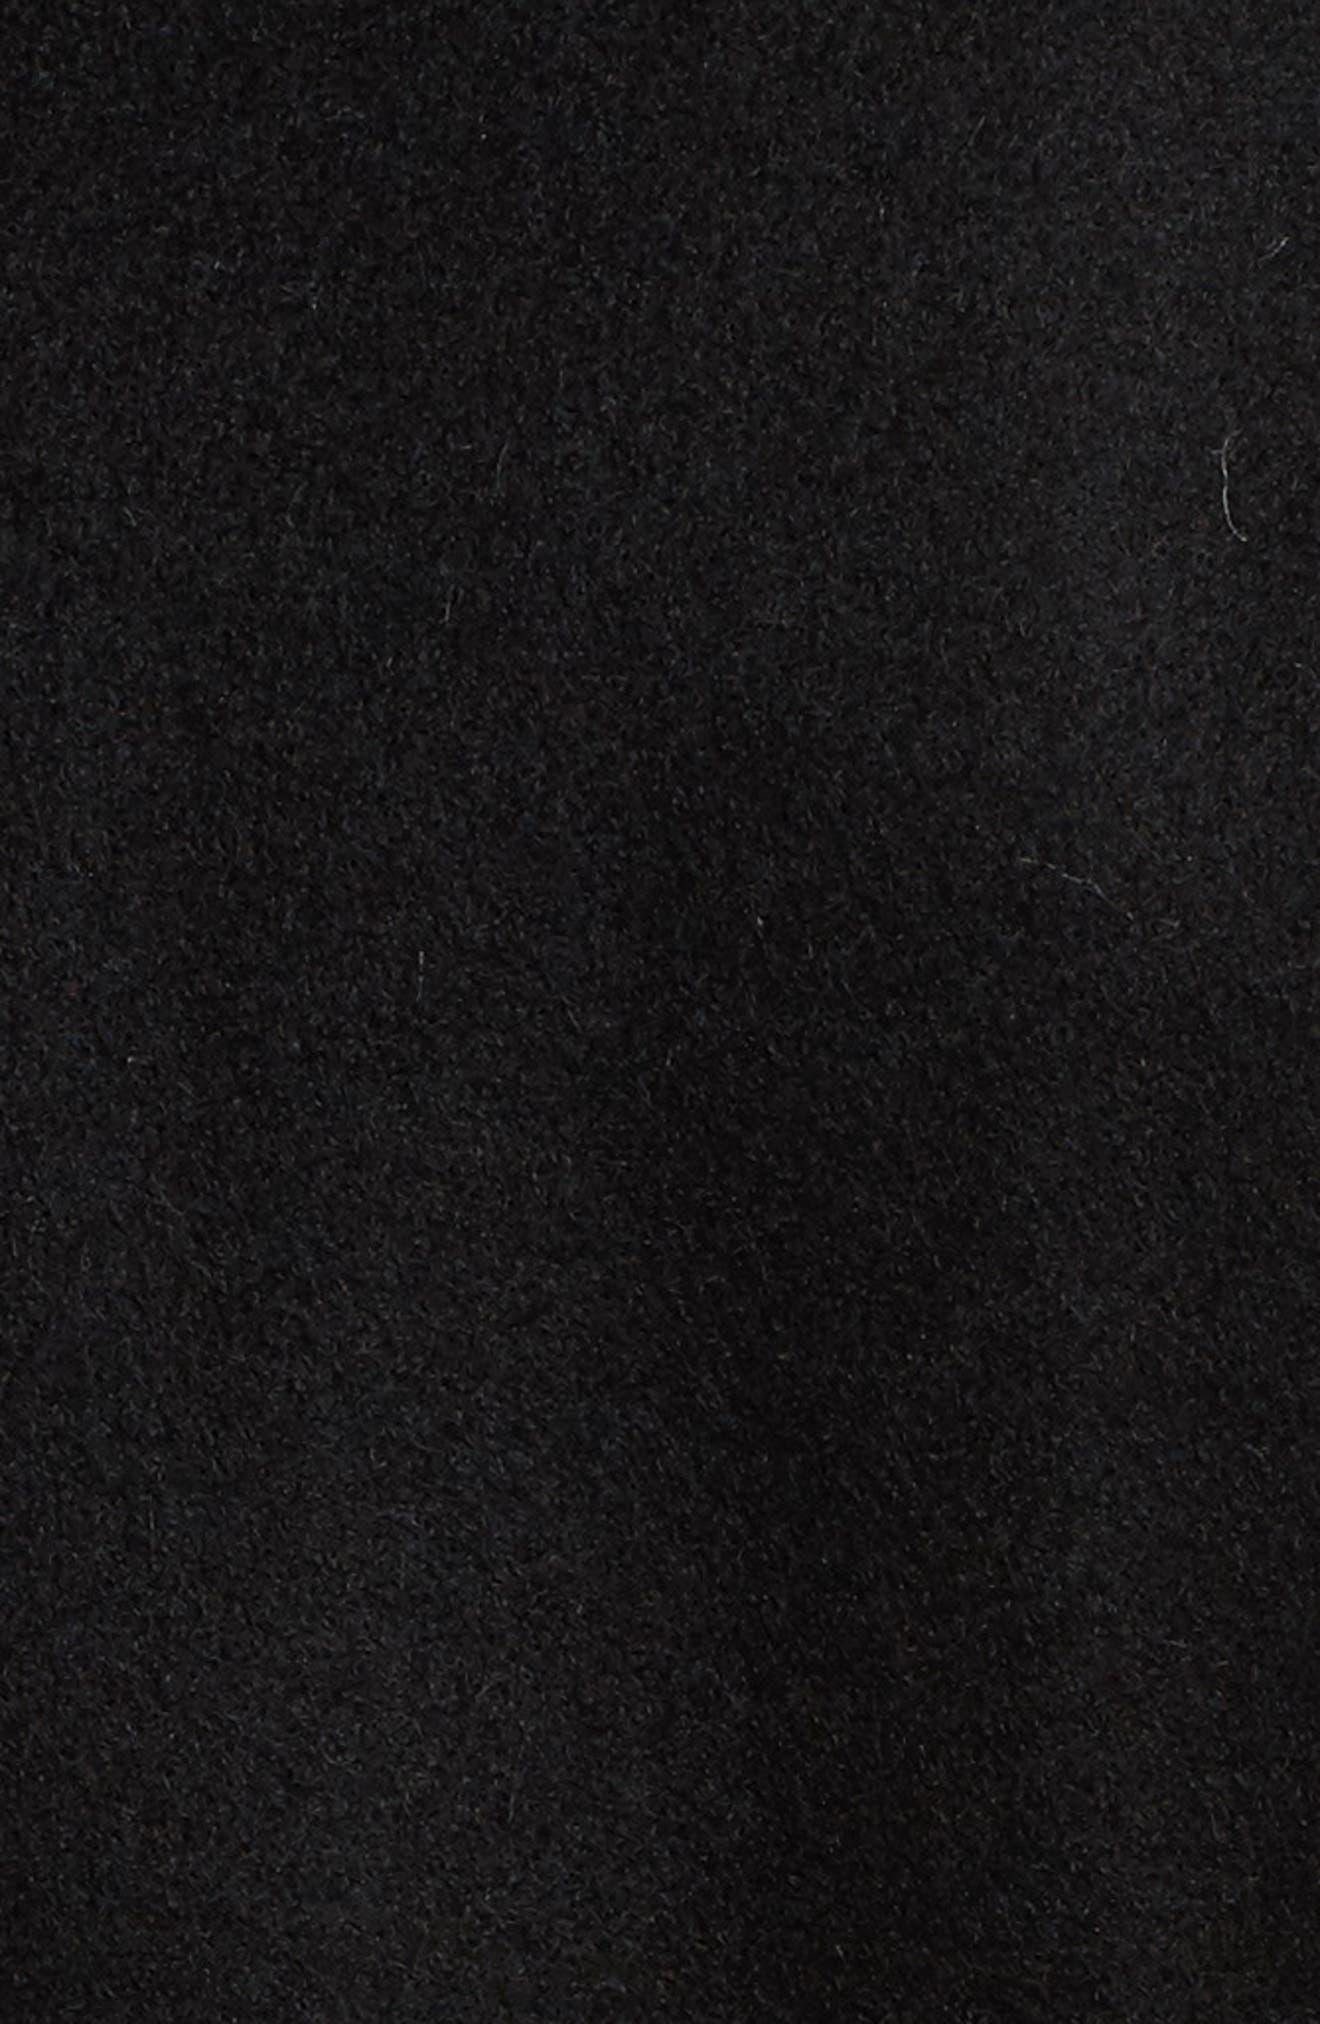 Faux Leather & Faux Fur Trim Belted Wool Blend Coat,                             Alternate thumbnail 42, color,